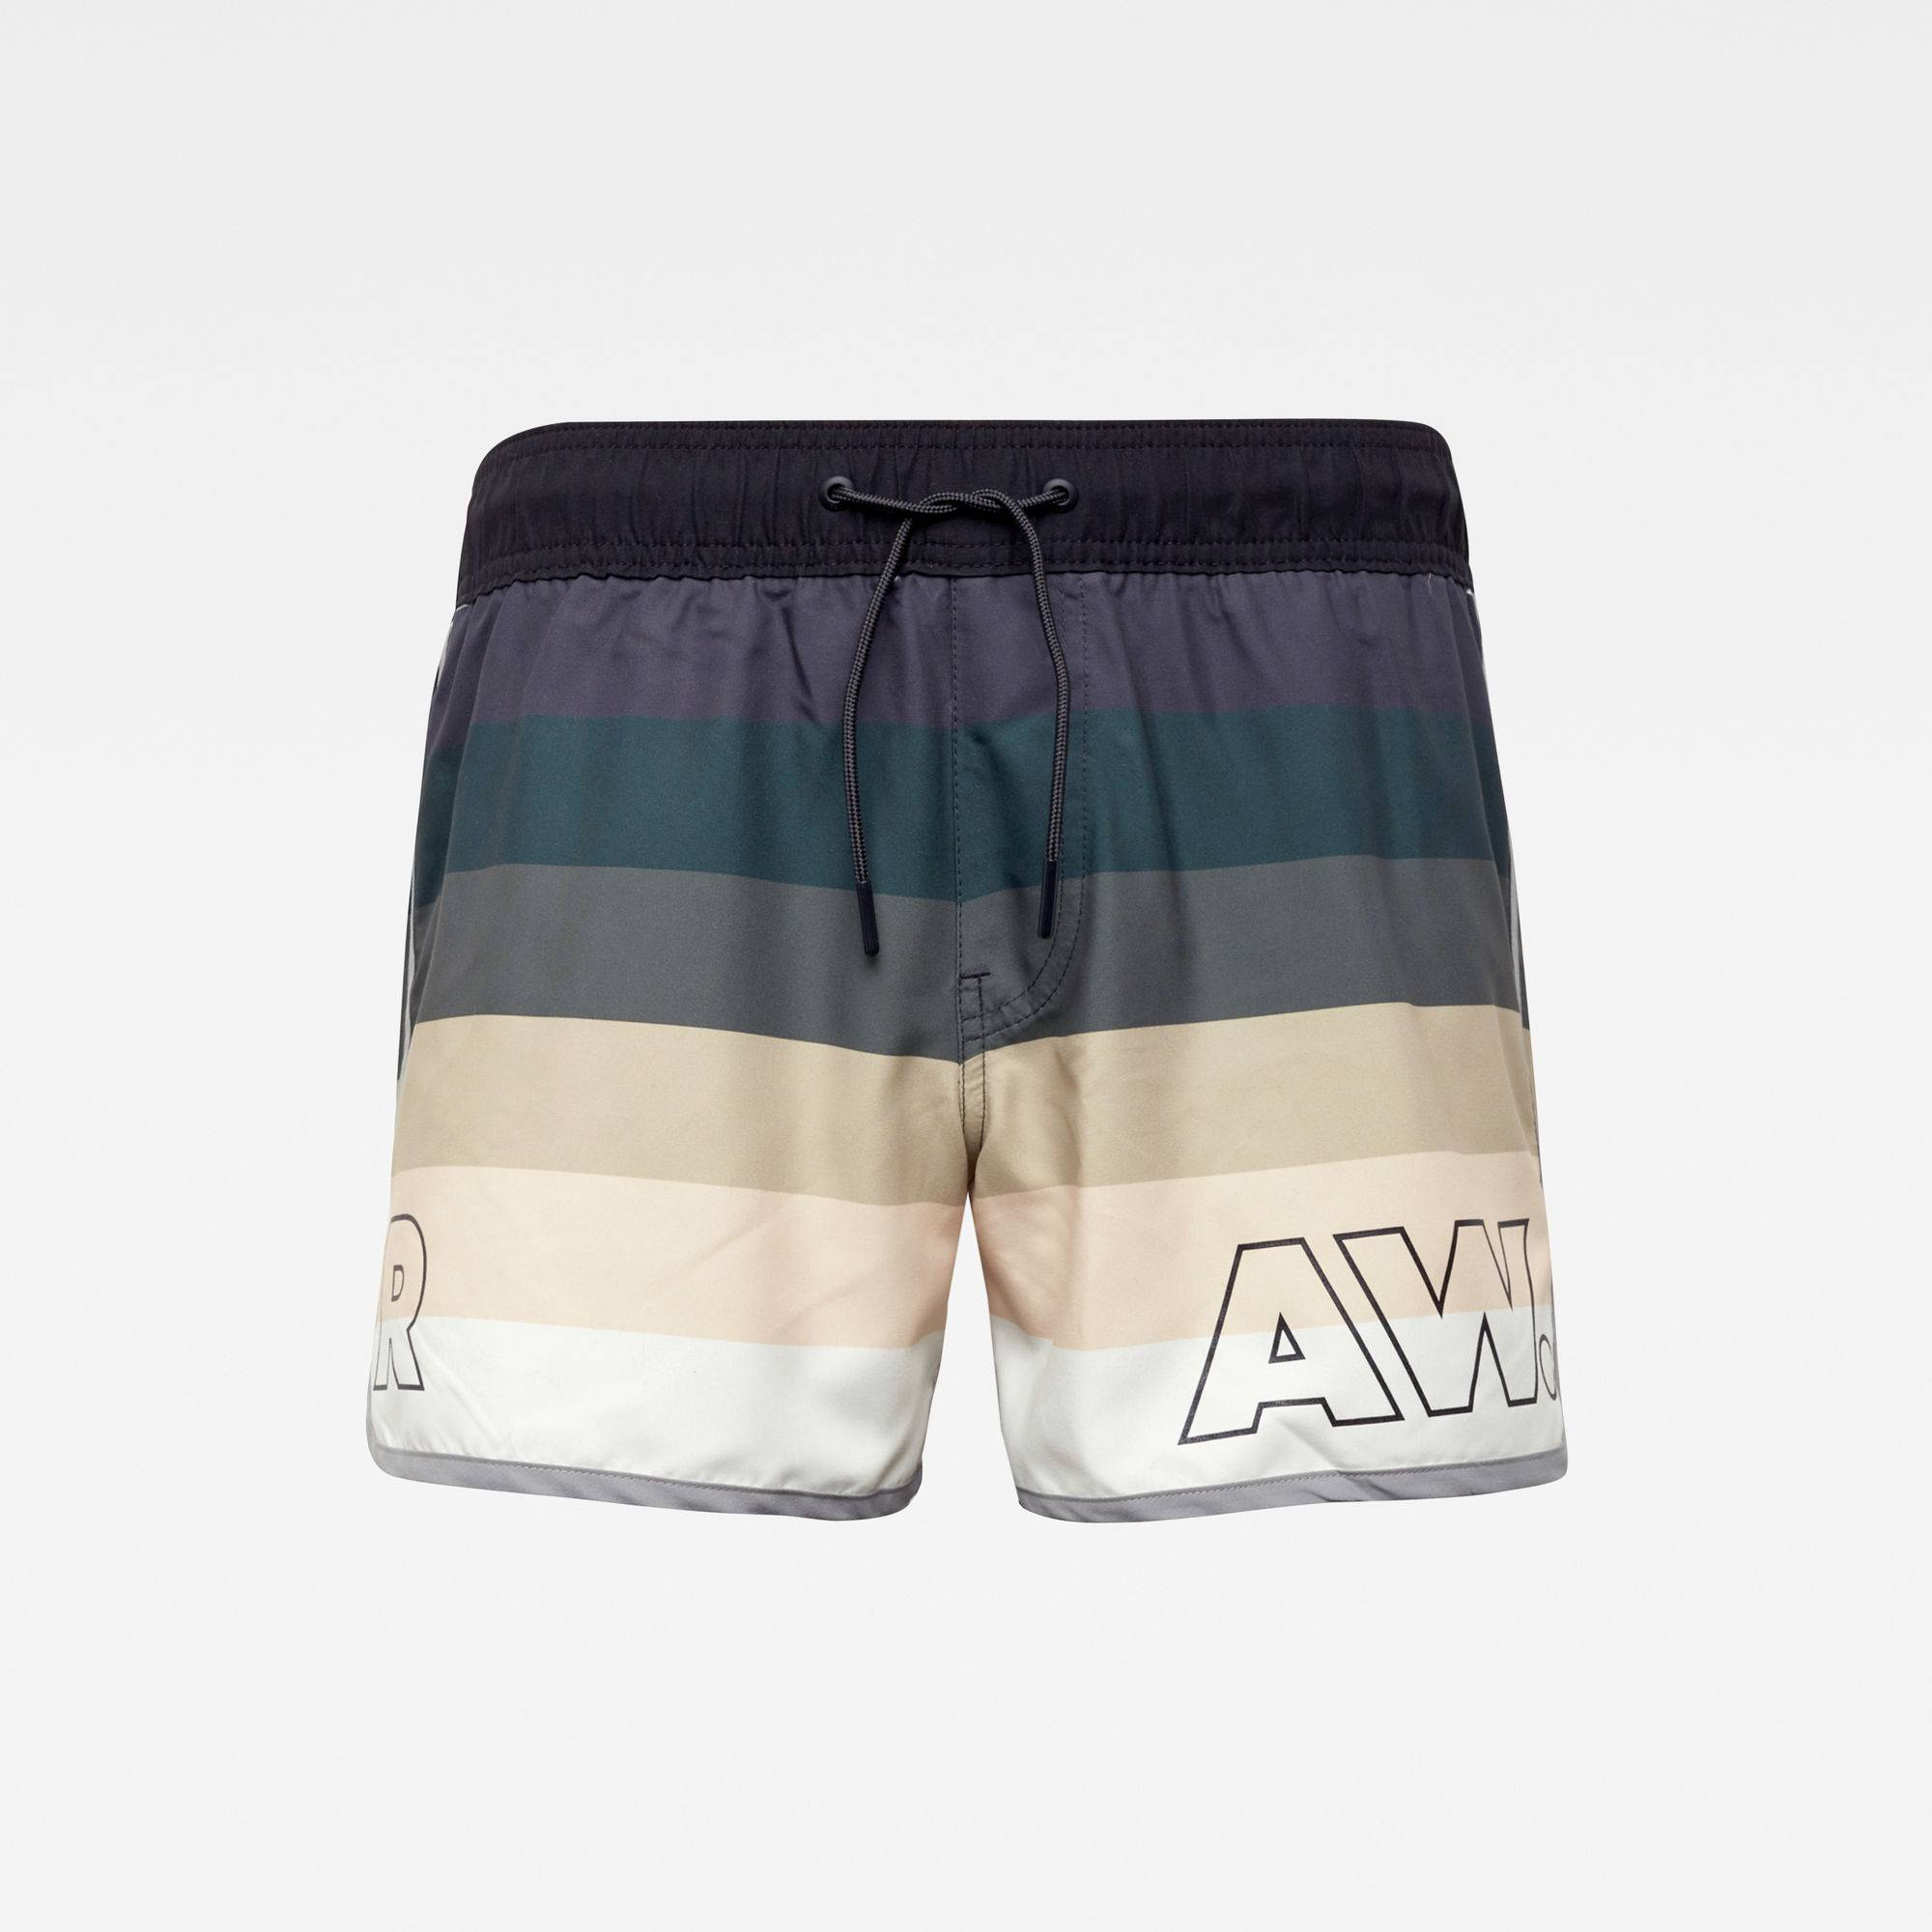 G-star RAW Hommes Short de bain Carnic Fade Multi couleur  - Taille: L M XS XL S